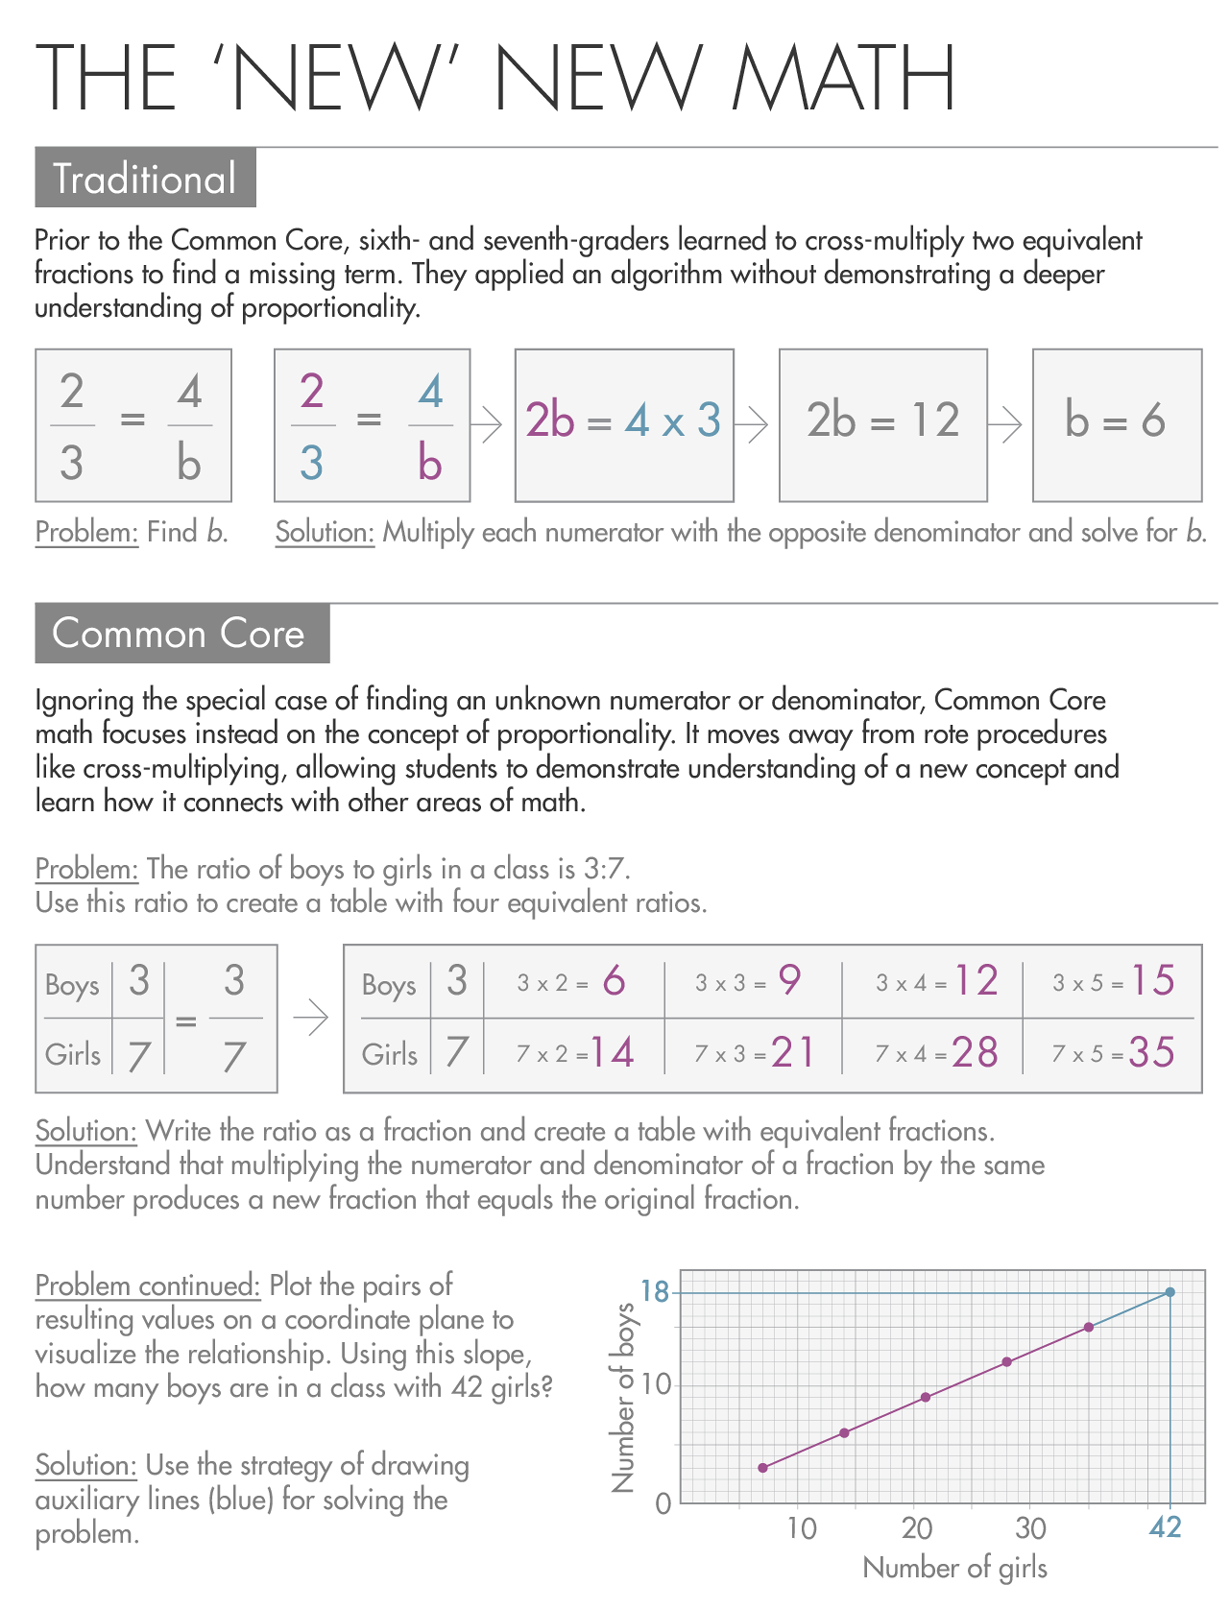 Math and Science Education – Pencils Down | Quanta Magazine